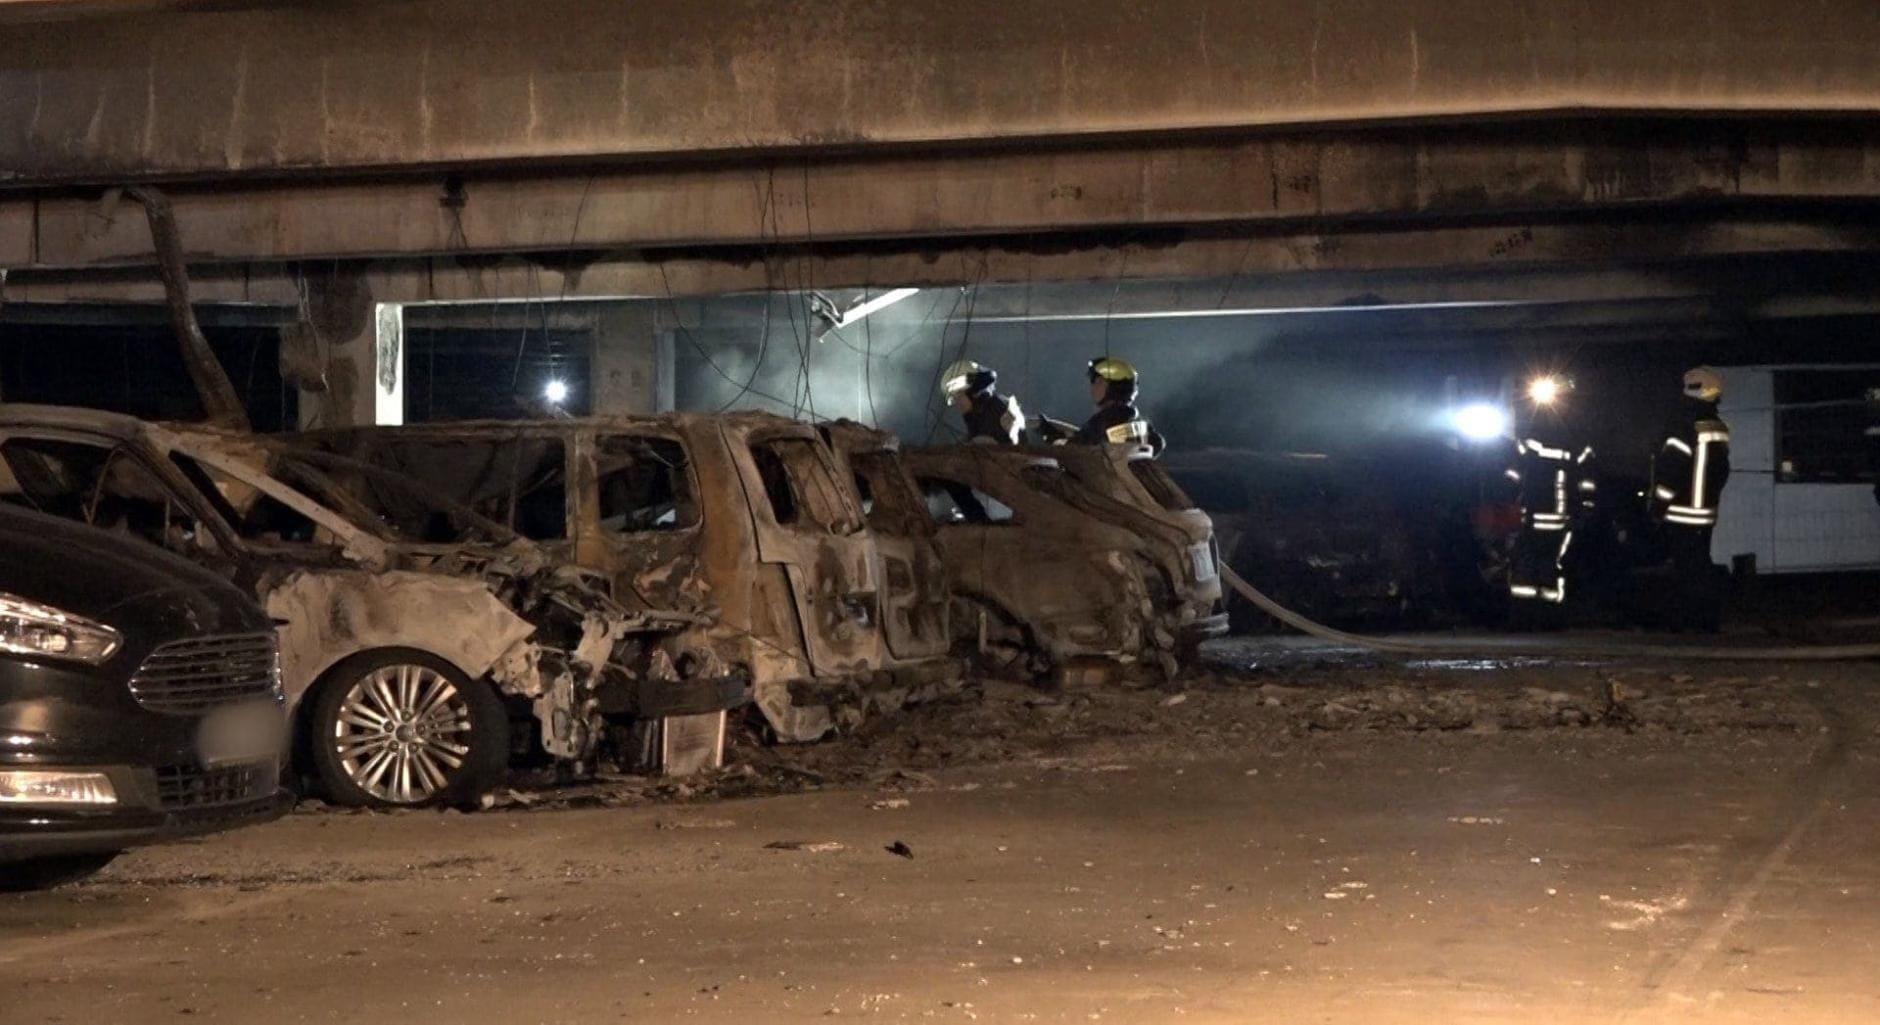 Feuer-Hölle am Flughafen Münster Osnabrück! 70 Autos in Flammen